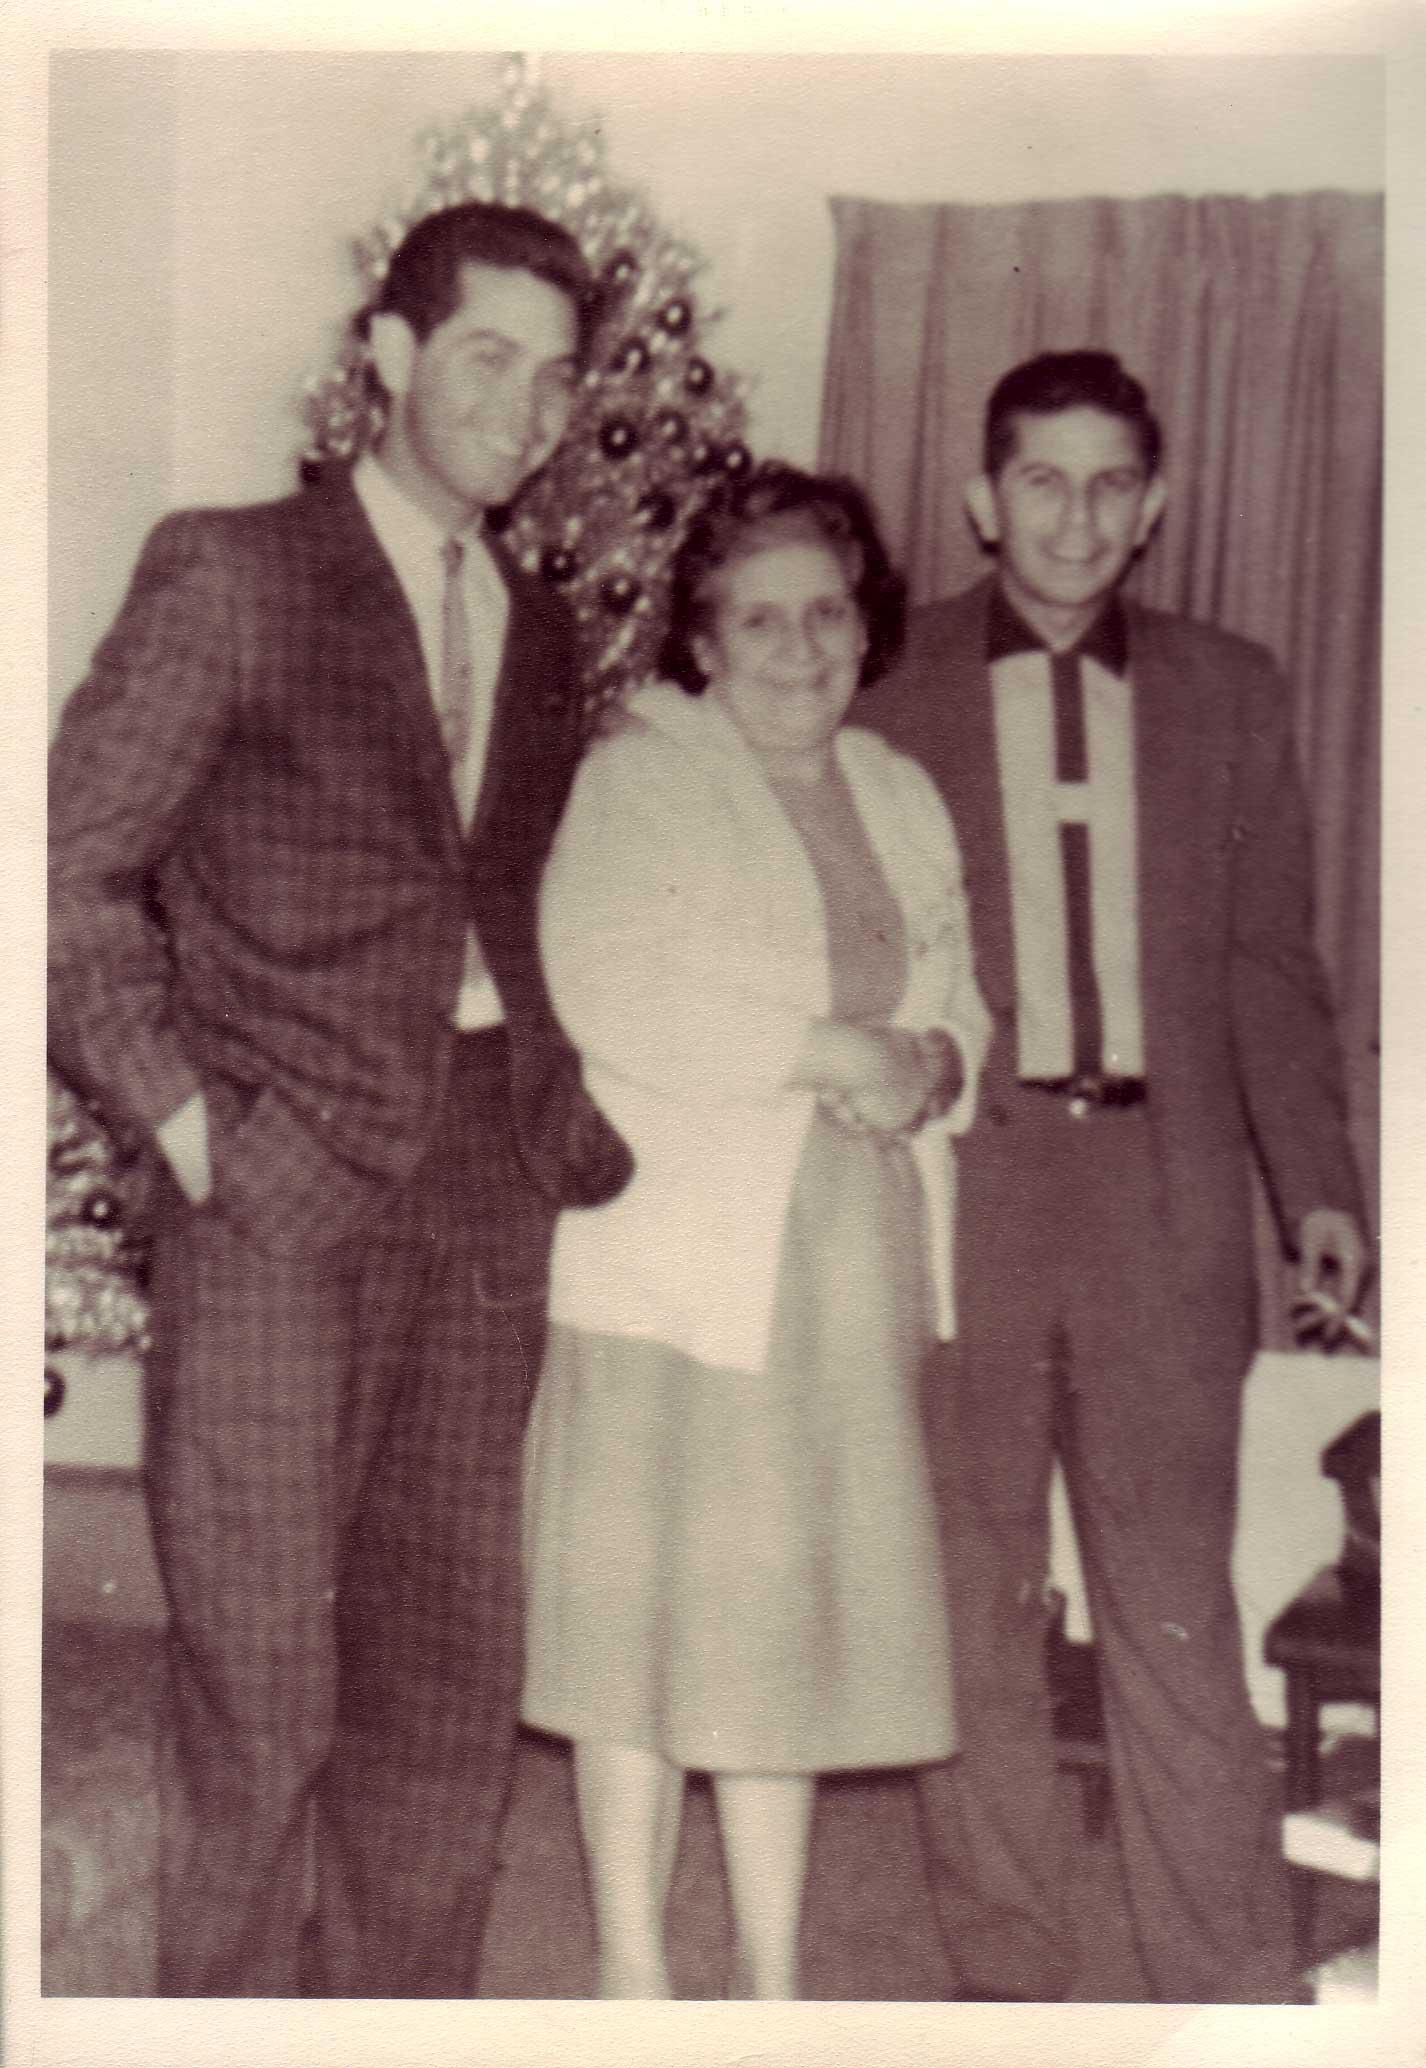 Albert, Consuelo and Louis Stoltz